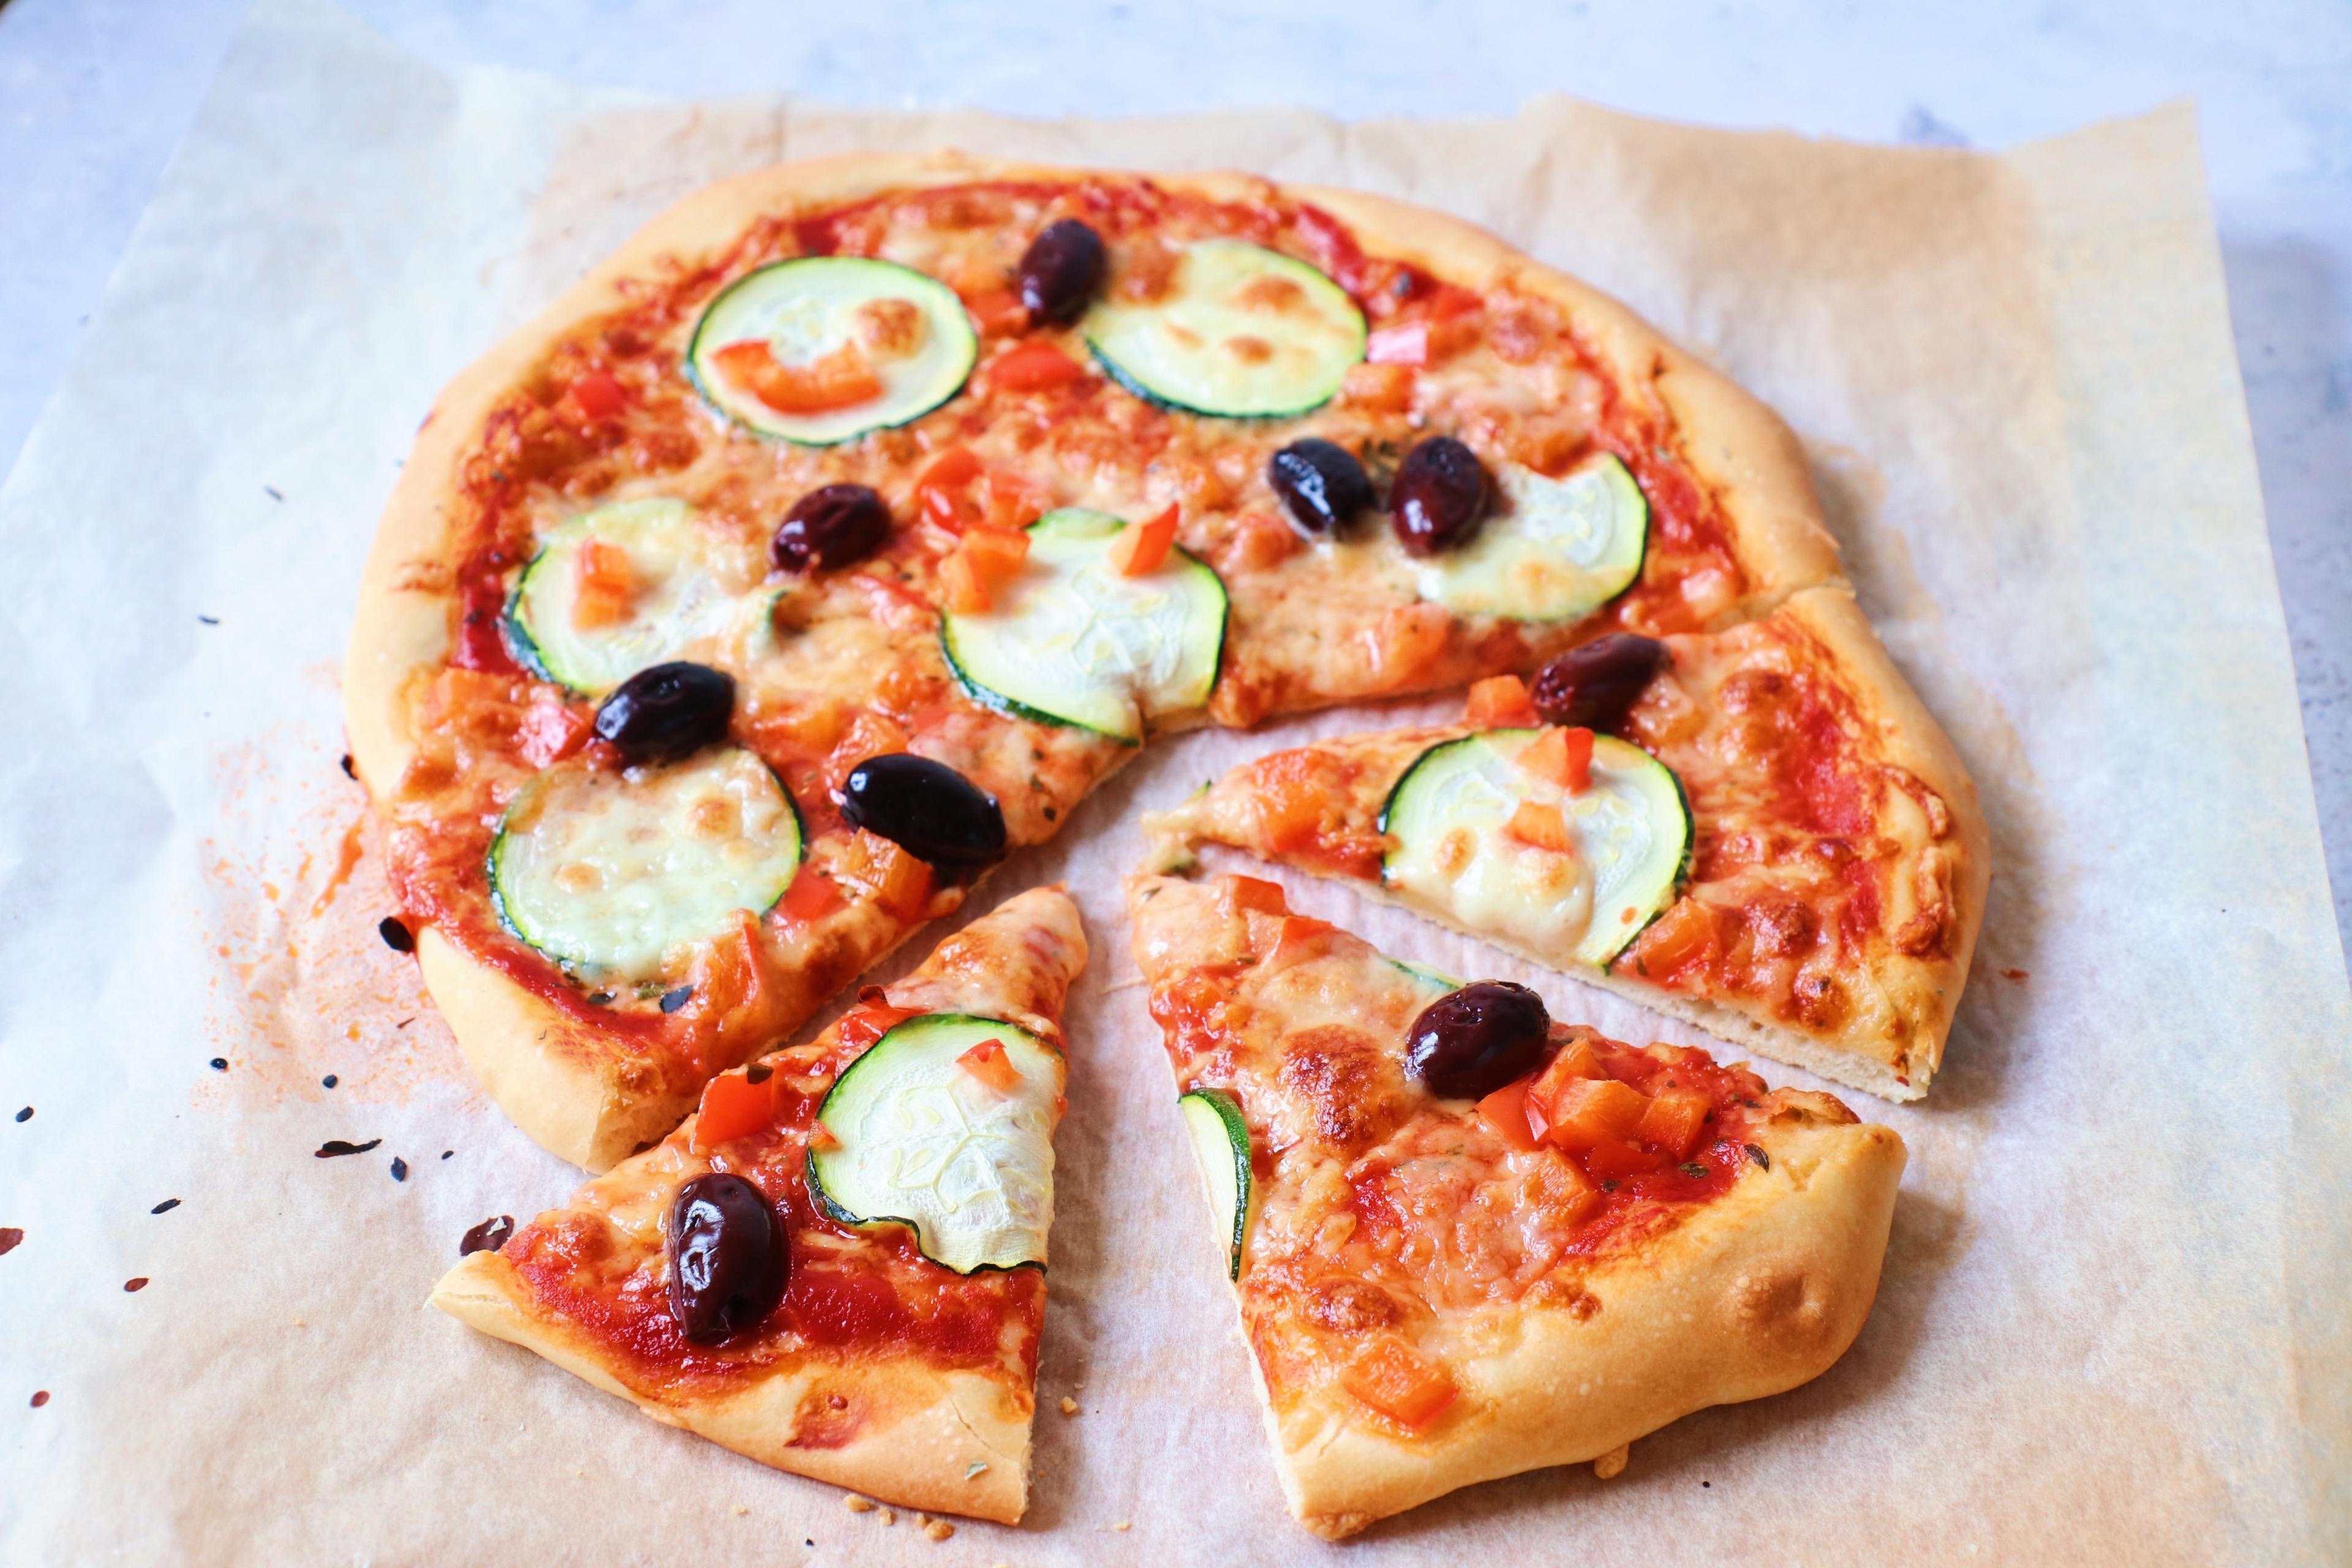 Recept zelfgemaakte vegetarische pizza courgette www.jaimyskitchen.nl